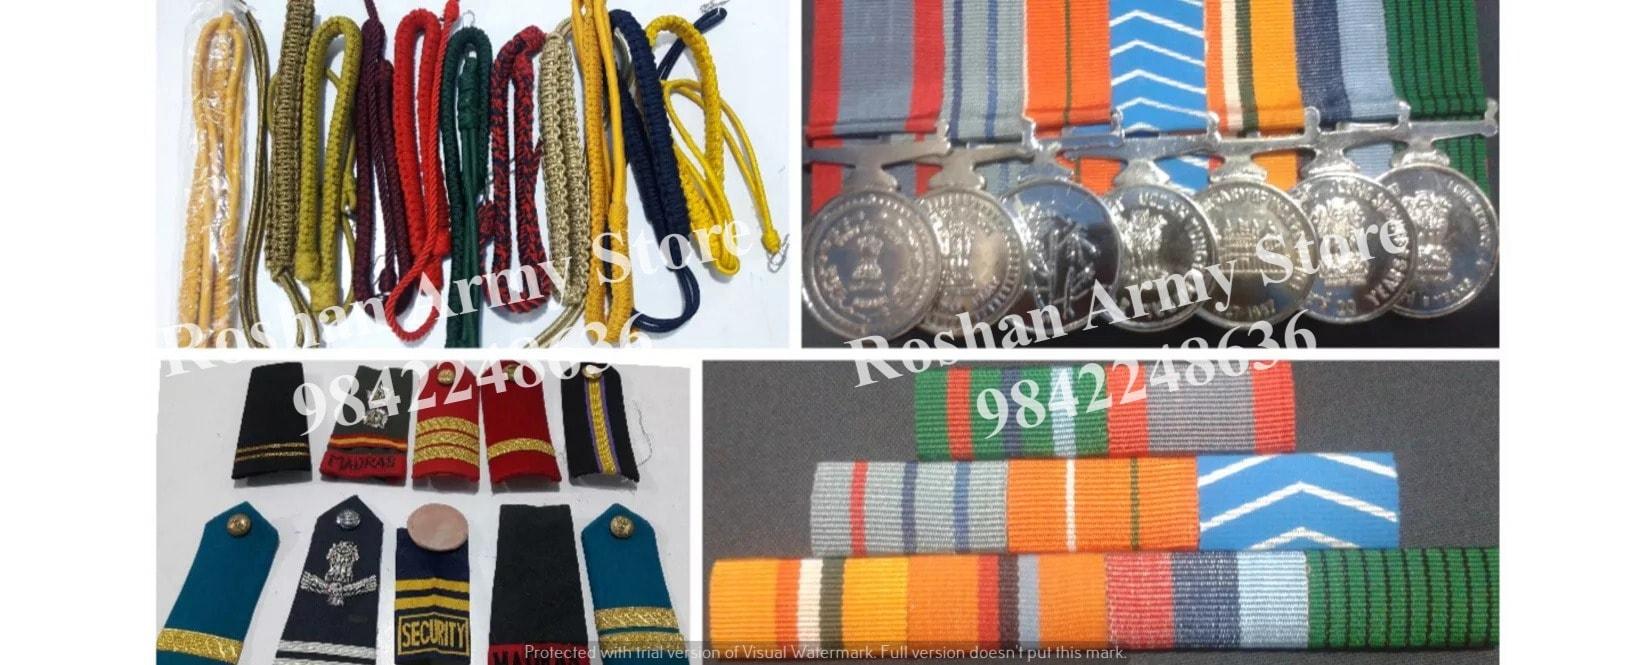 Roshan Army Store - Uniform Manufacturer and Supplier in Puliyakulam, Coimbatore